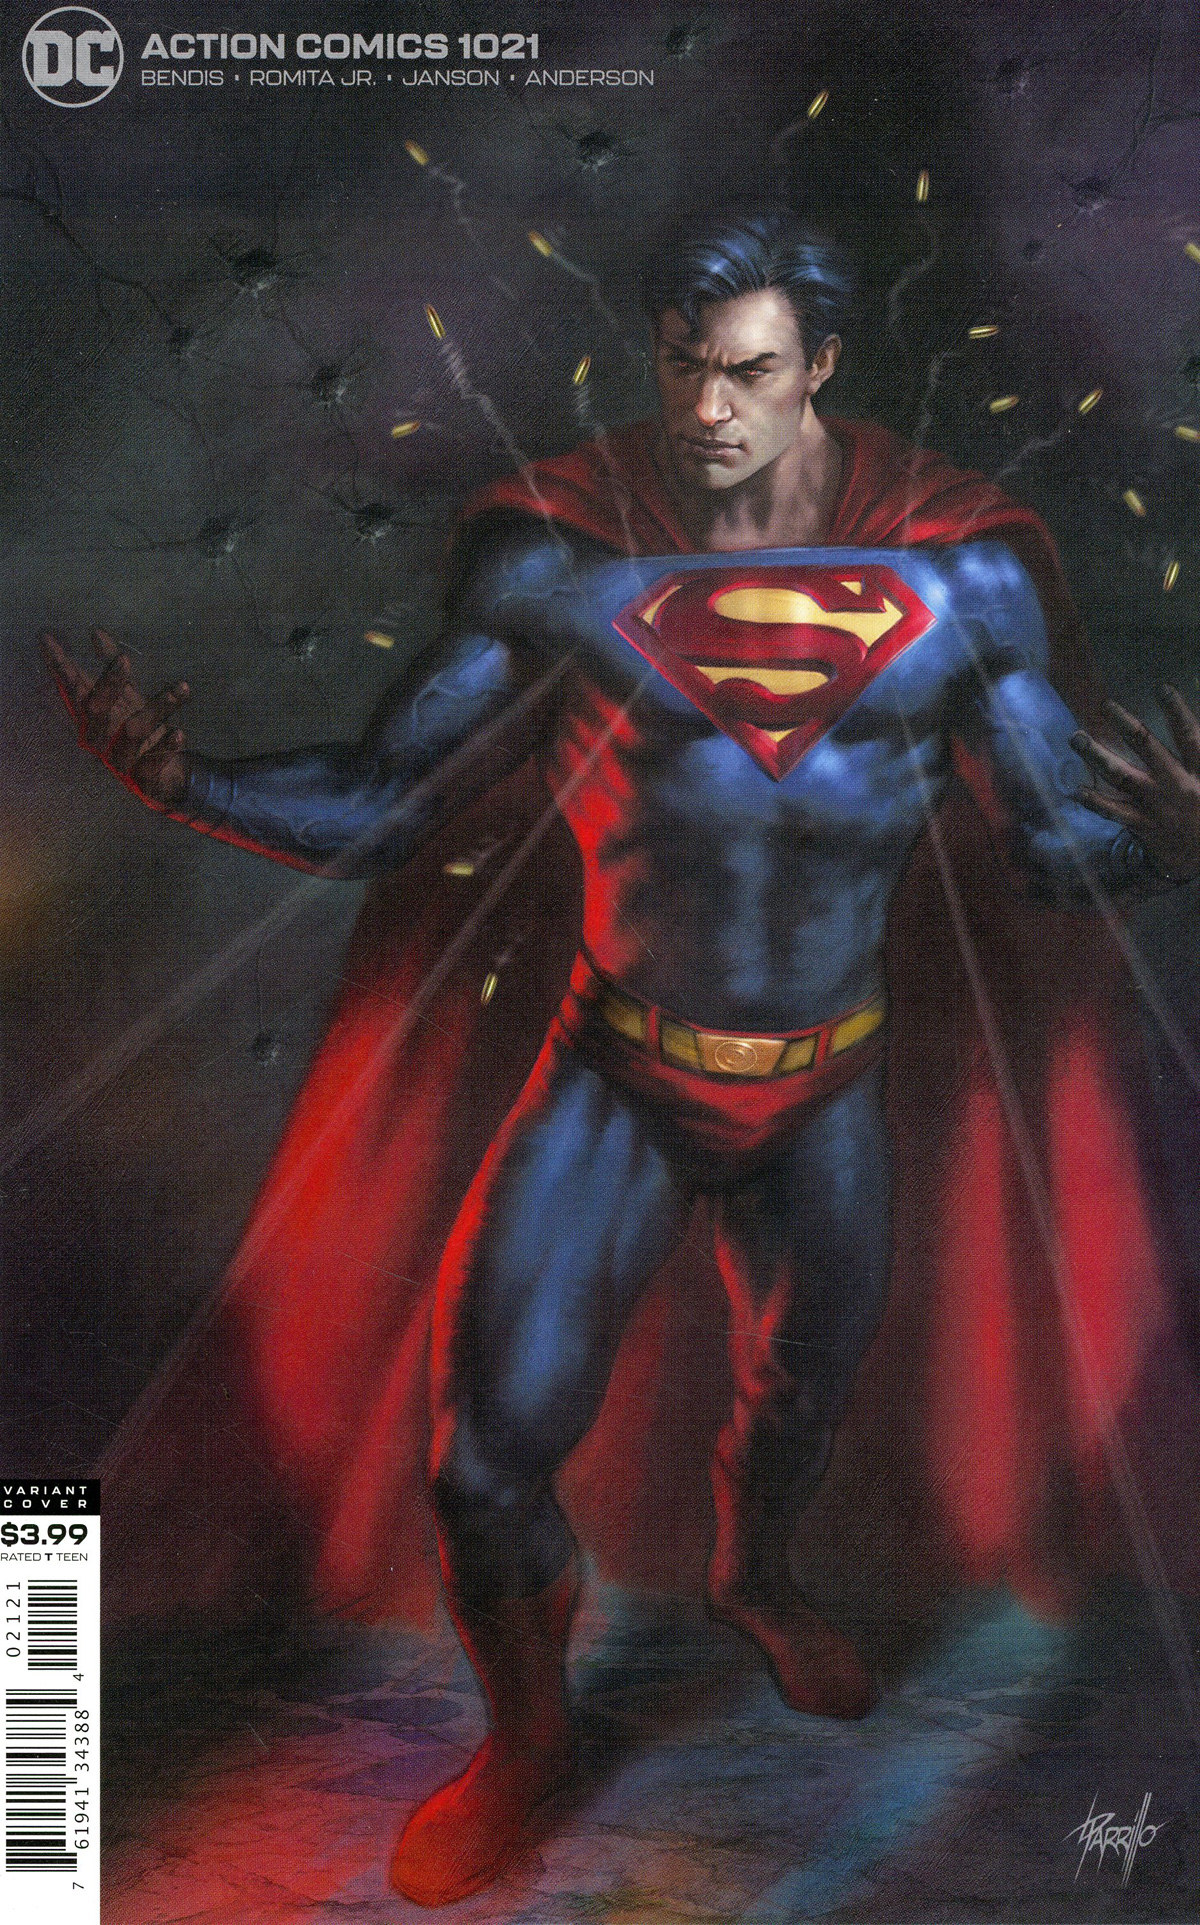 Action Comics Vol 2 #1021 Cover B Variant Lucio Parrillo Cover